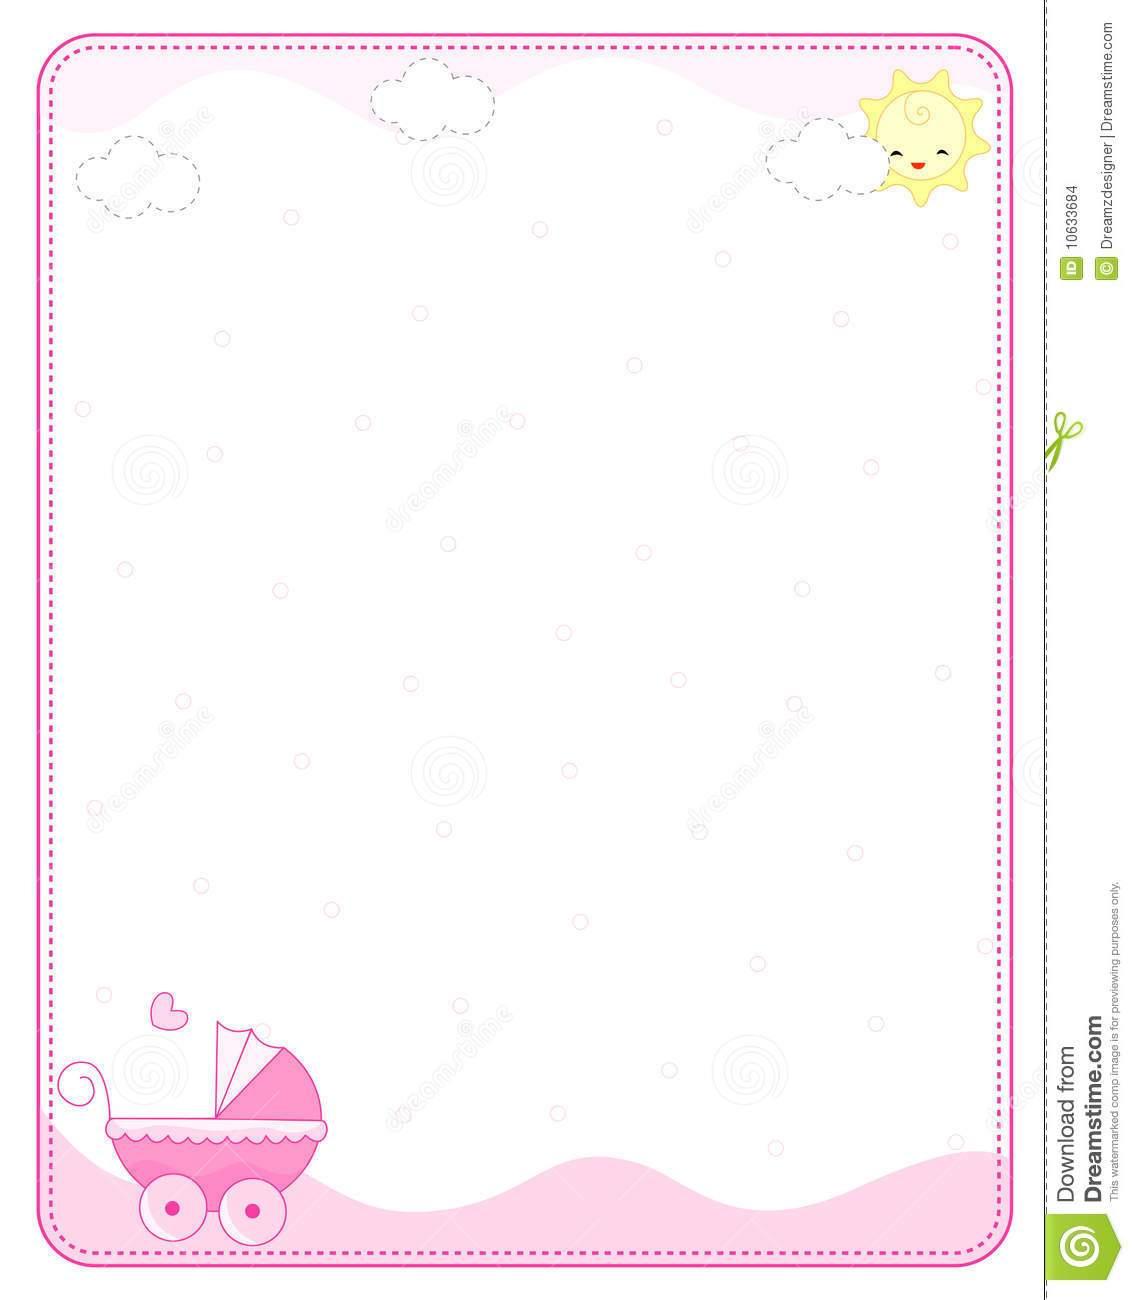 Clipart baby borders 7 » Clipart Portal.